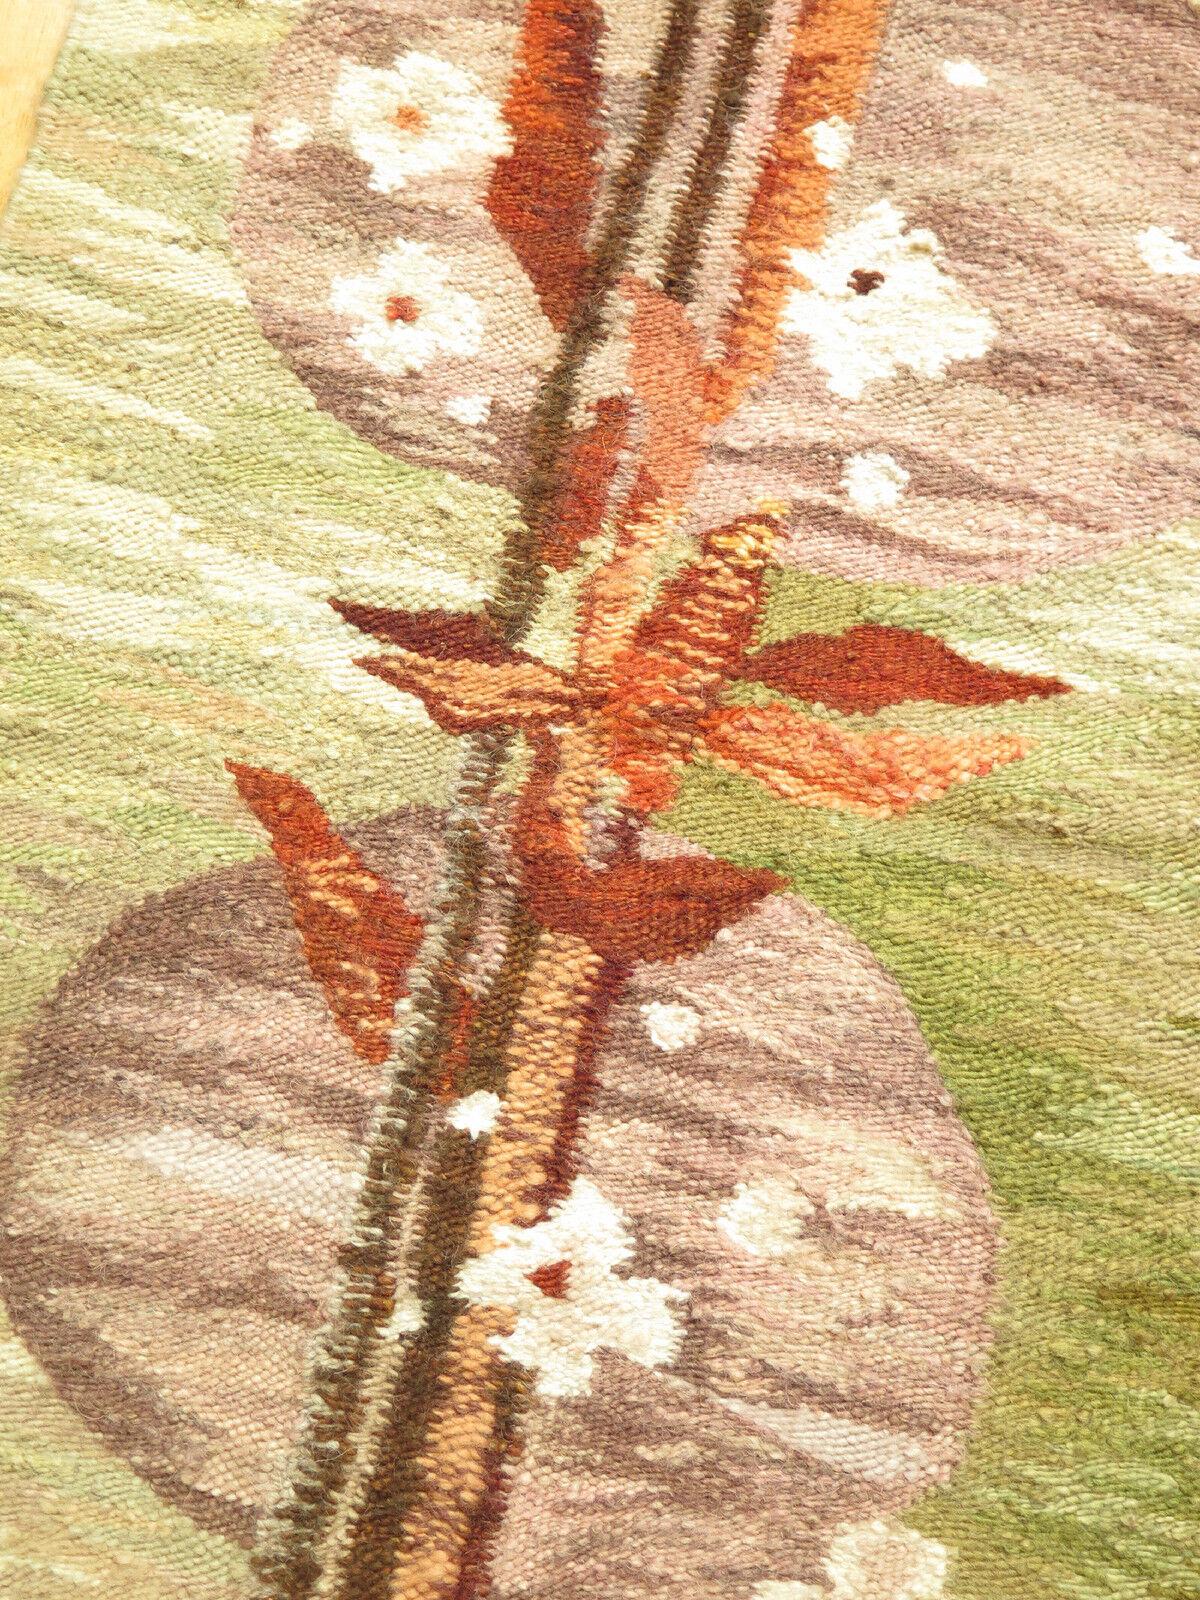 Vintage Polish HANDWOVEN HANDWOVEN HANDWOVEN WOOL KILIM  BOUQUET  61x87 cm   Tapestry Rug 1960s 165468